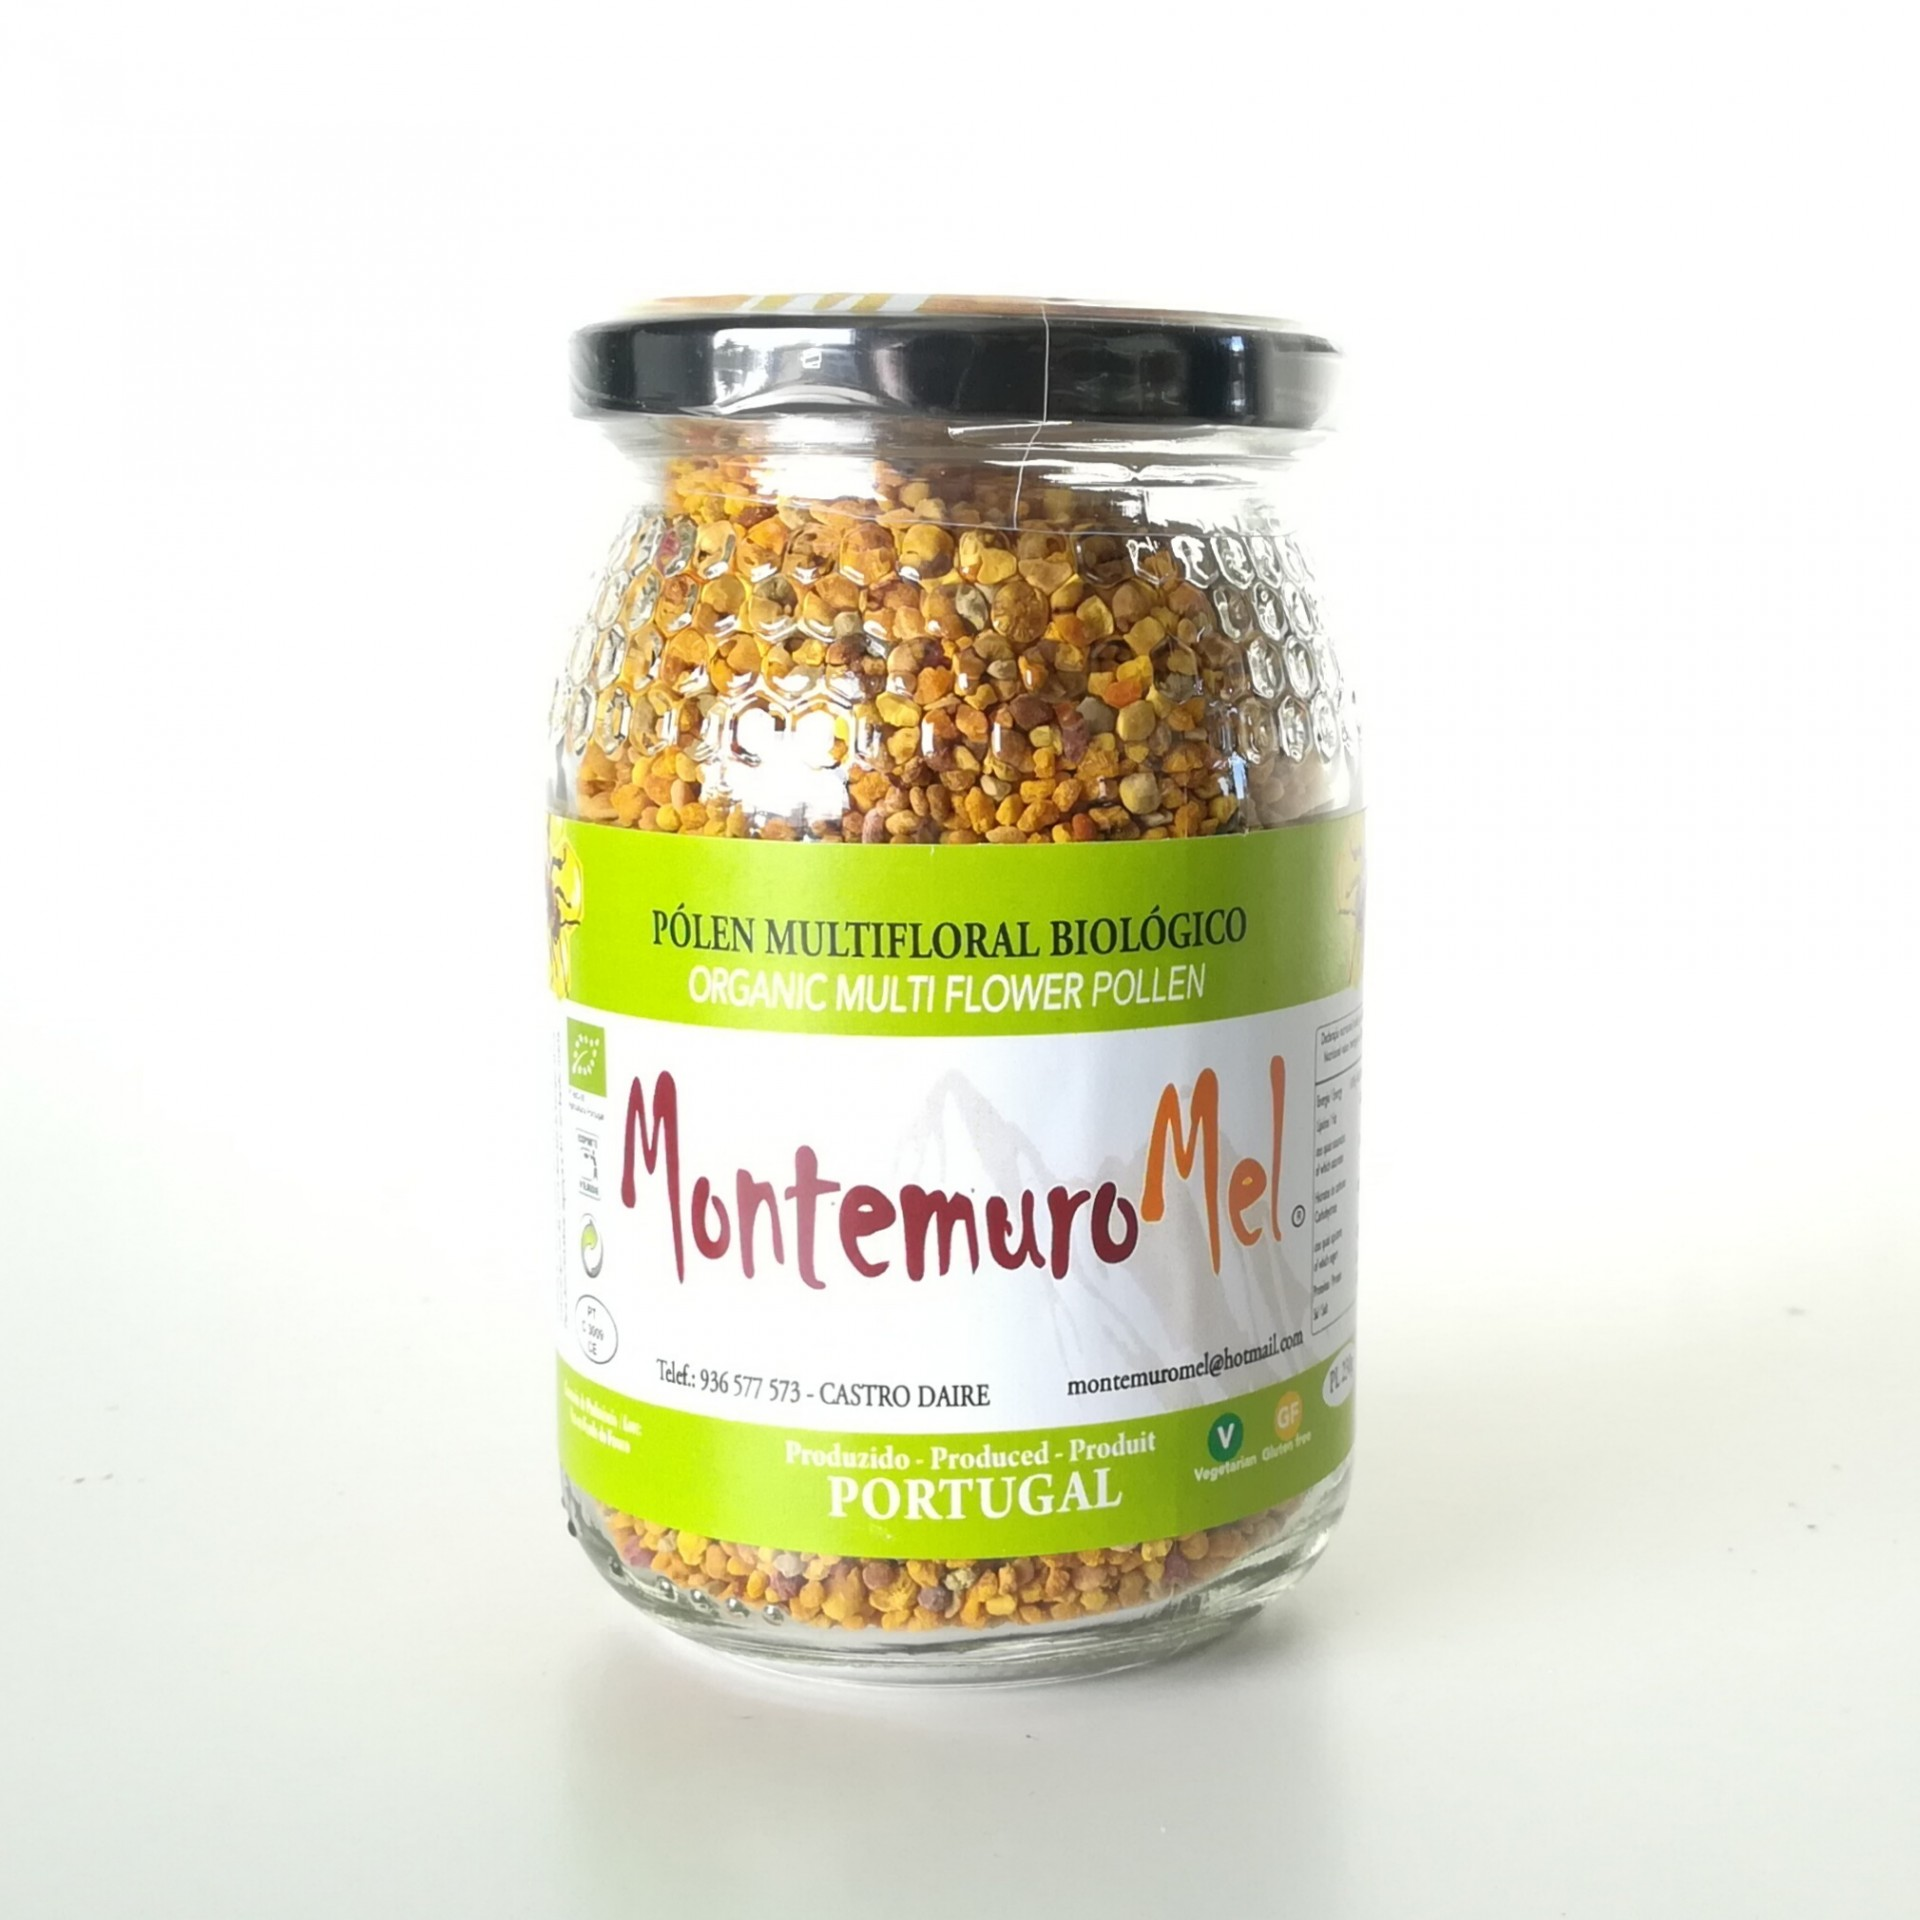 Pólen Multifloral BIO - 220gr - Serra do Montemuro